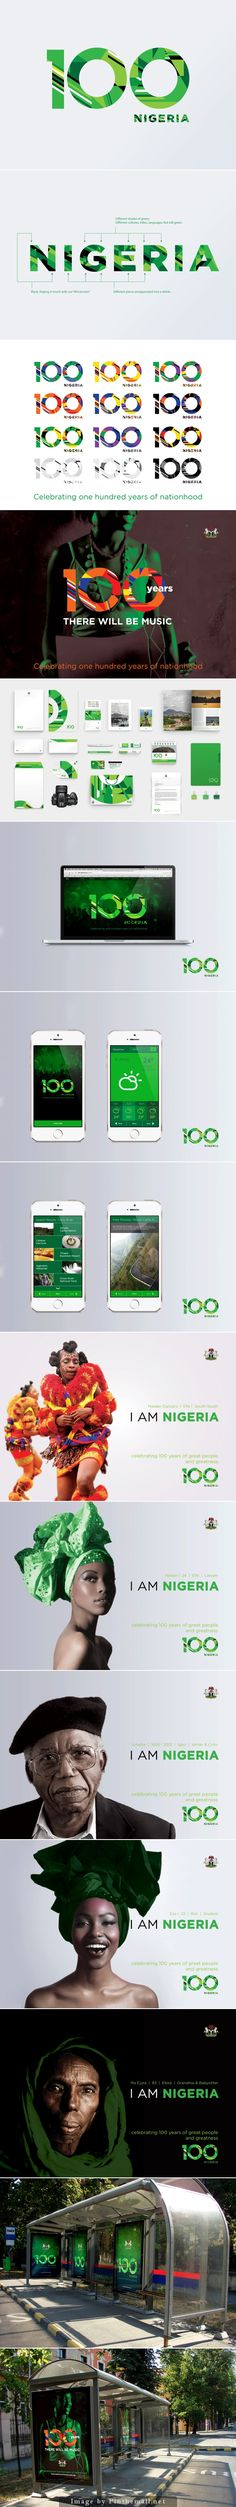 Nigeria 100 by O. Ashiwel Ochui. - created via http://pinthemall.net